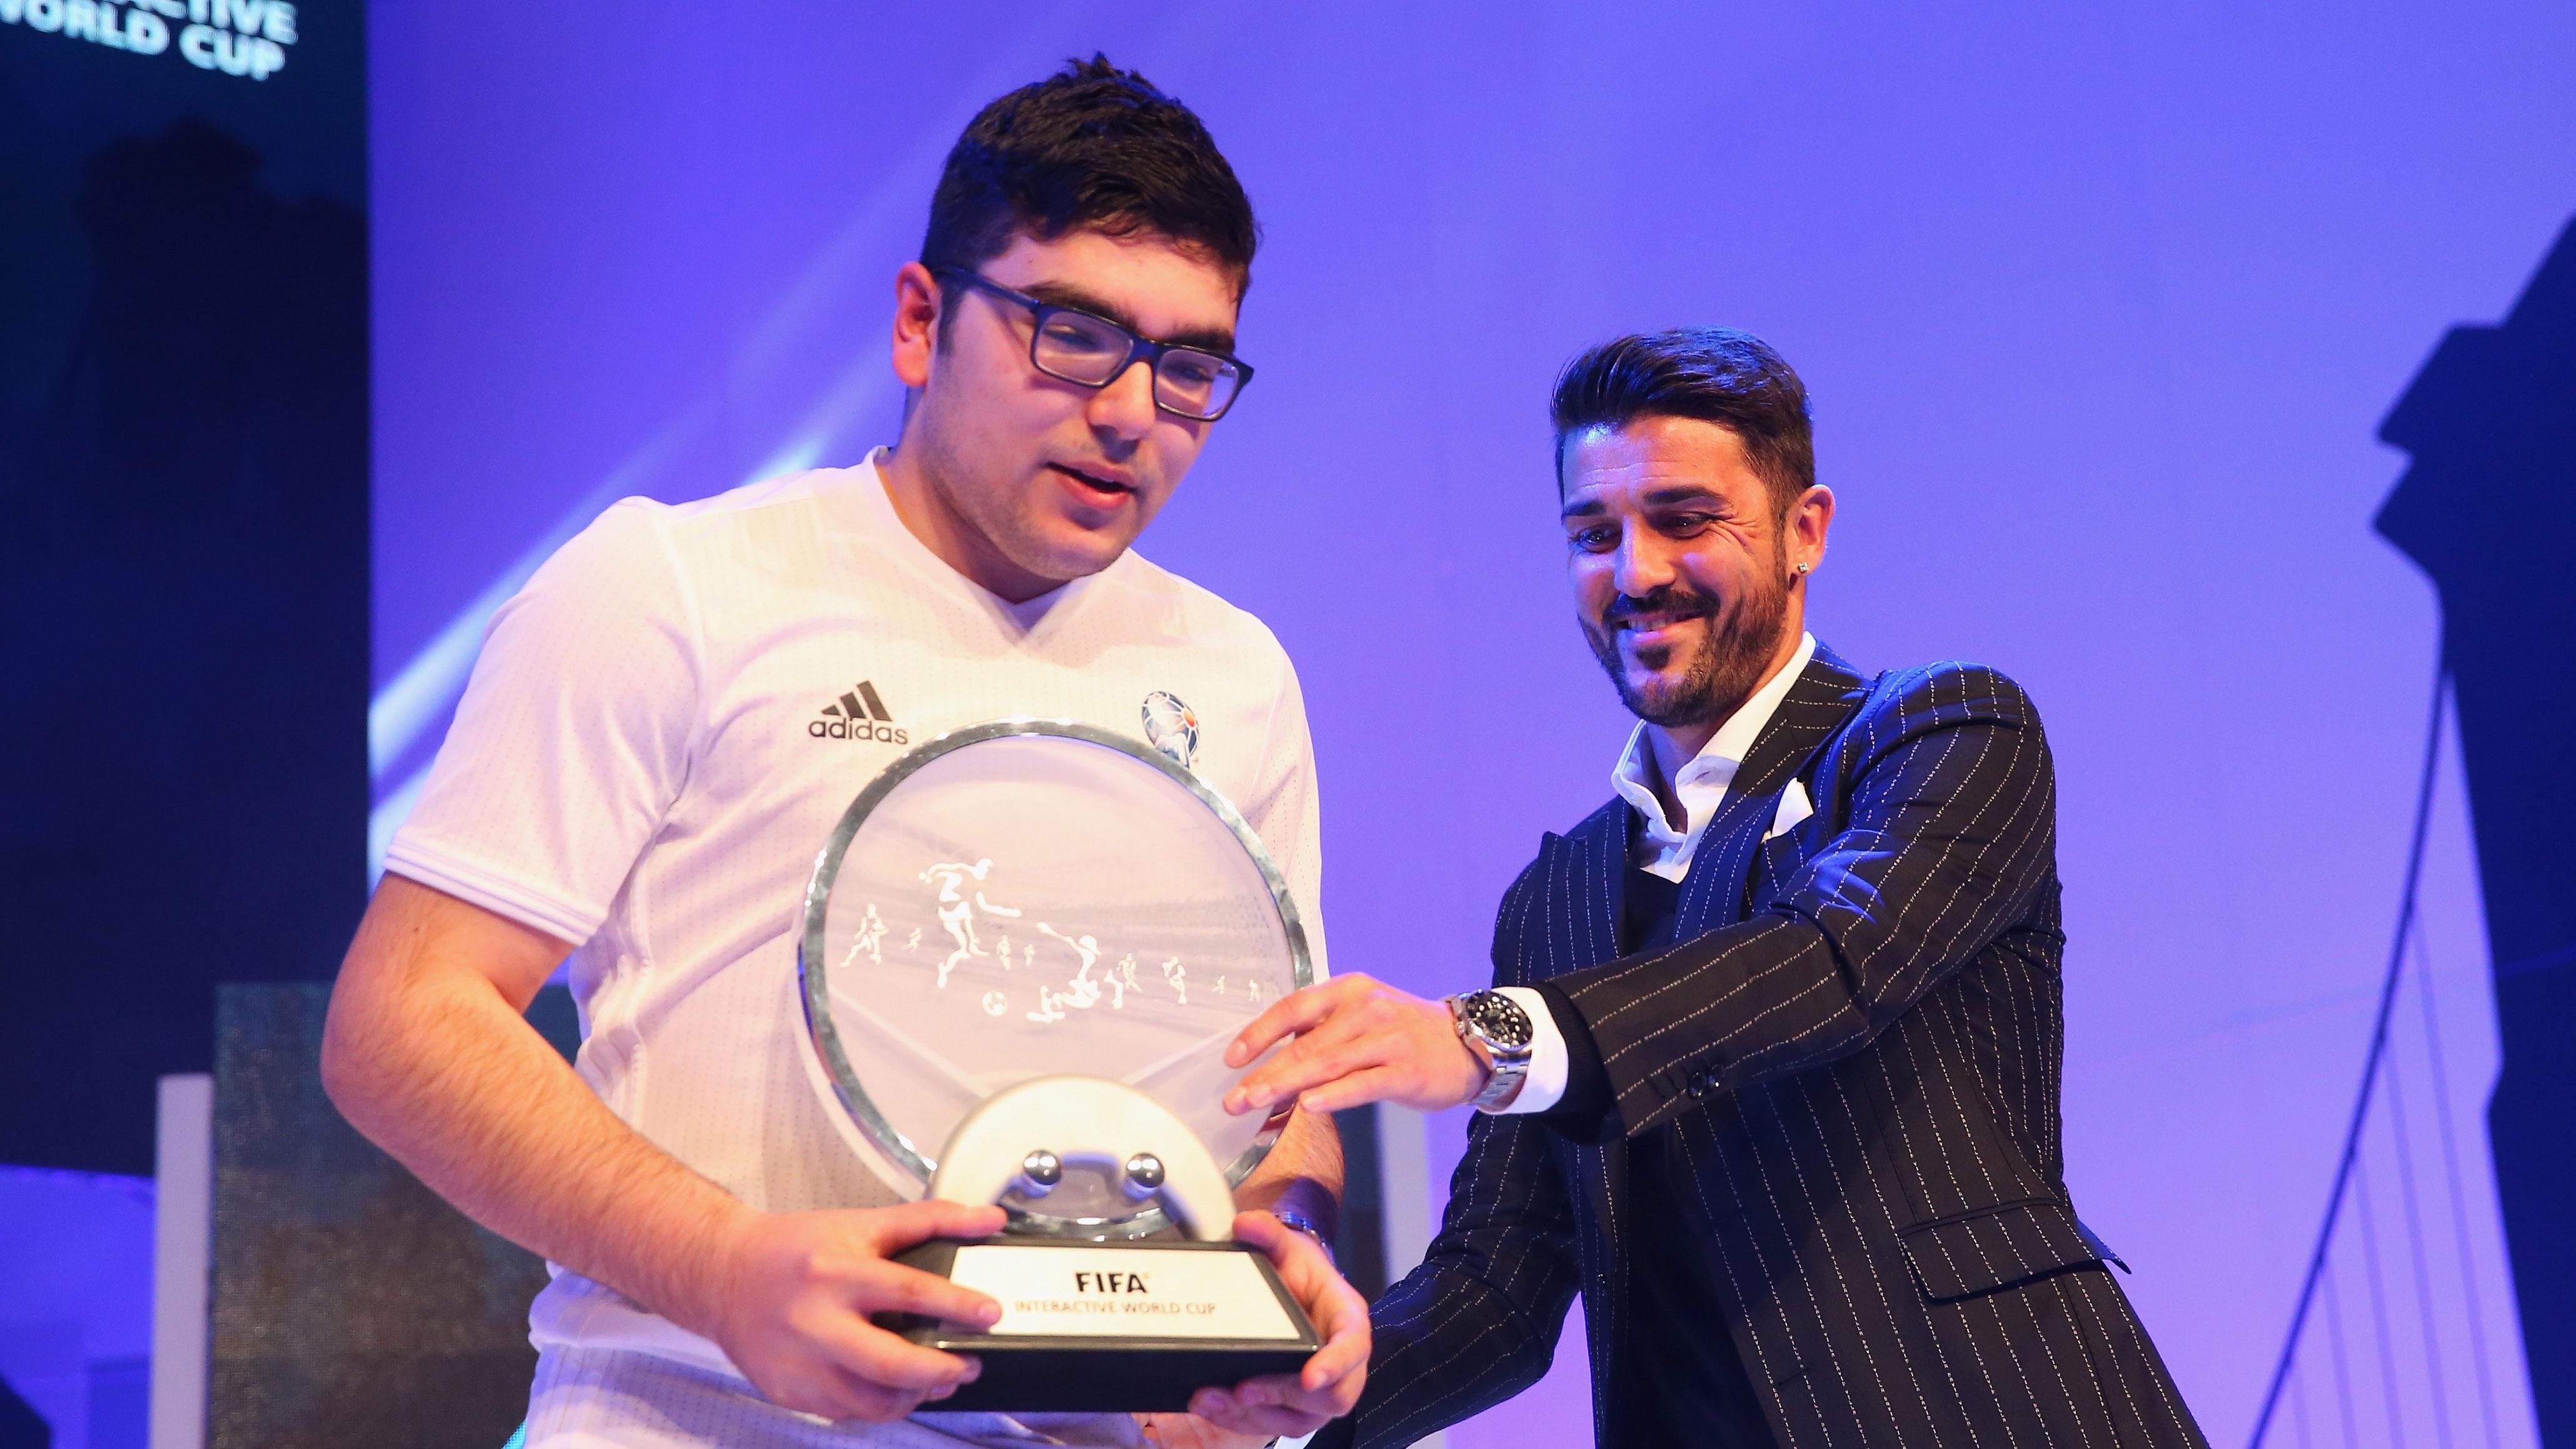 fifa interactive world cup 2016 mohamad al-bacha wins